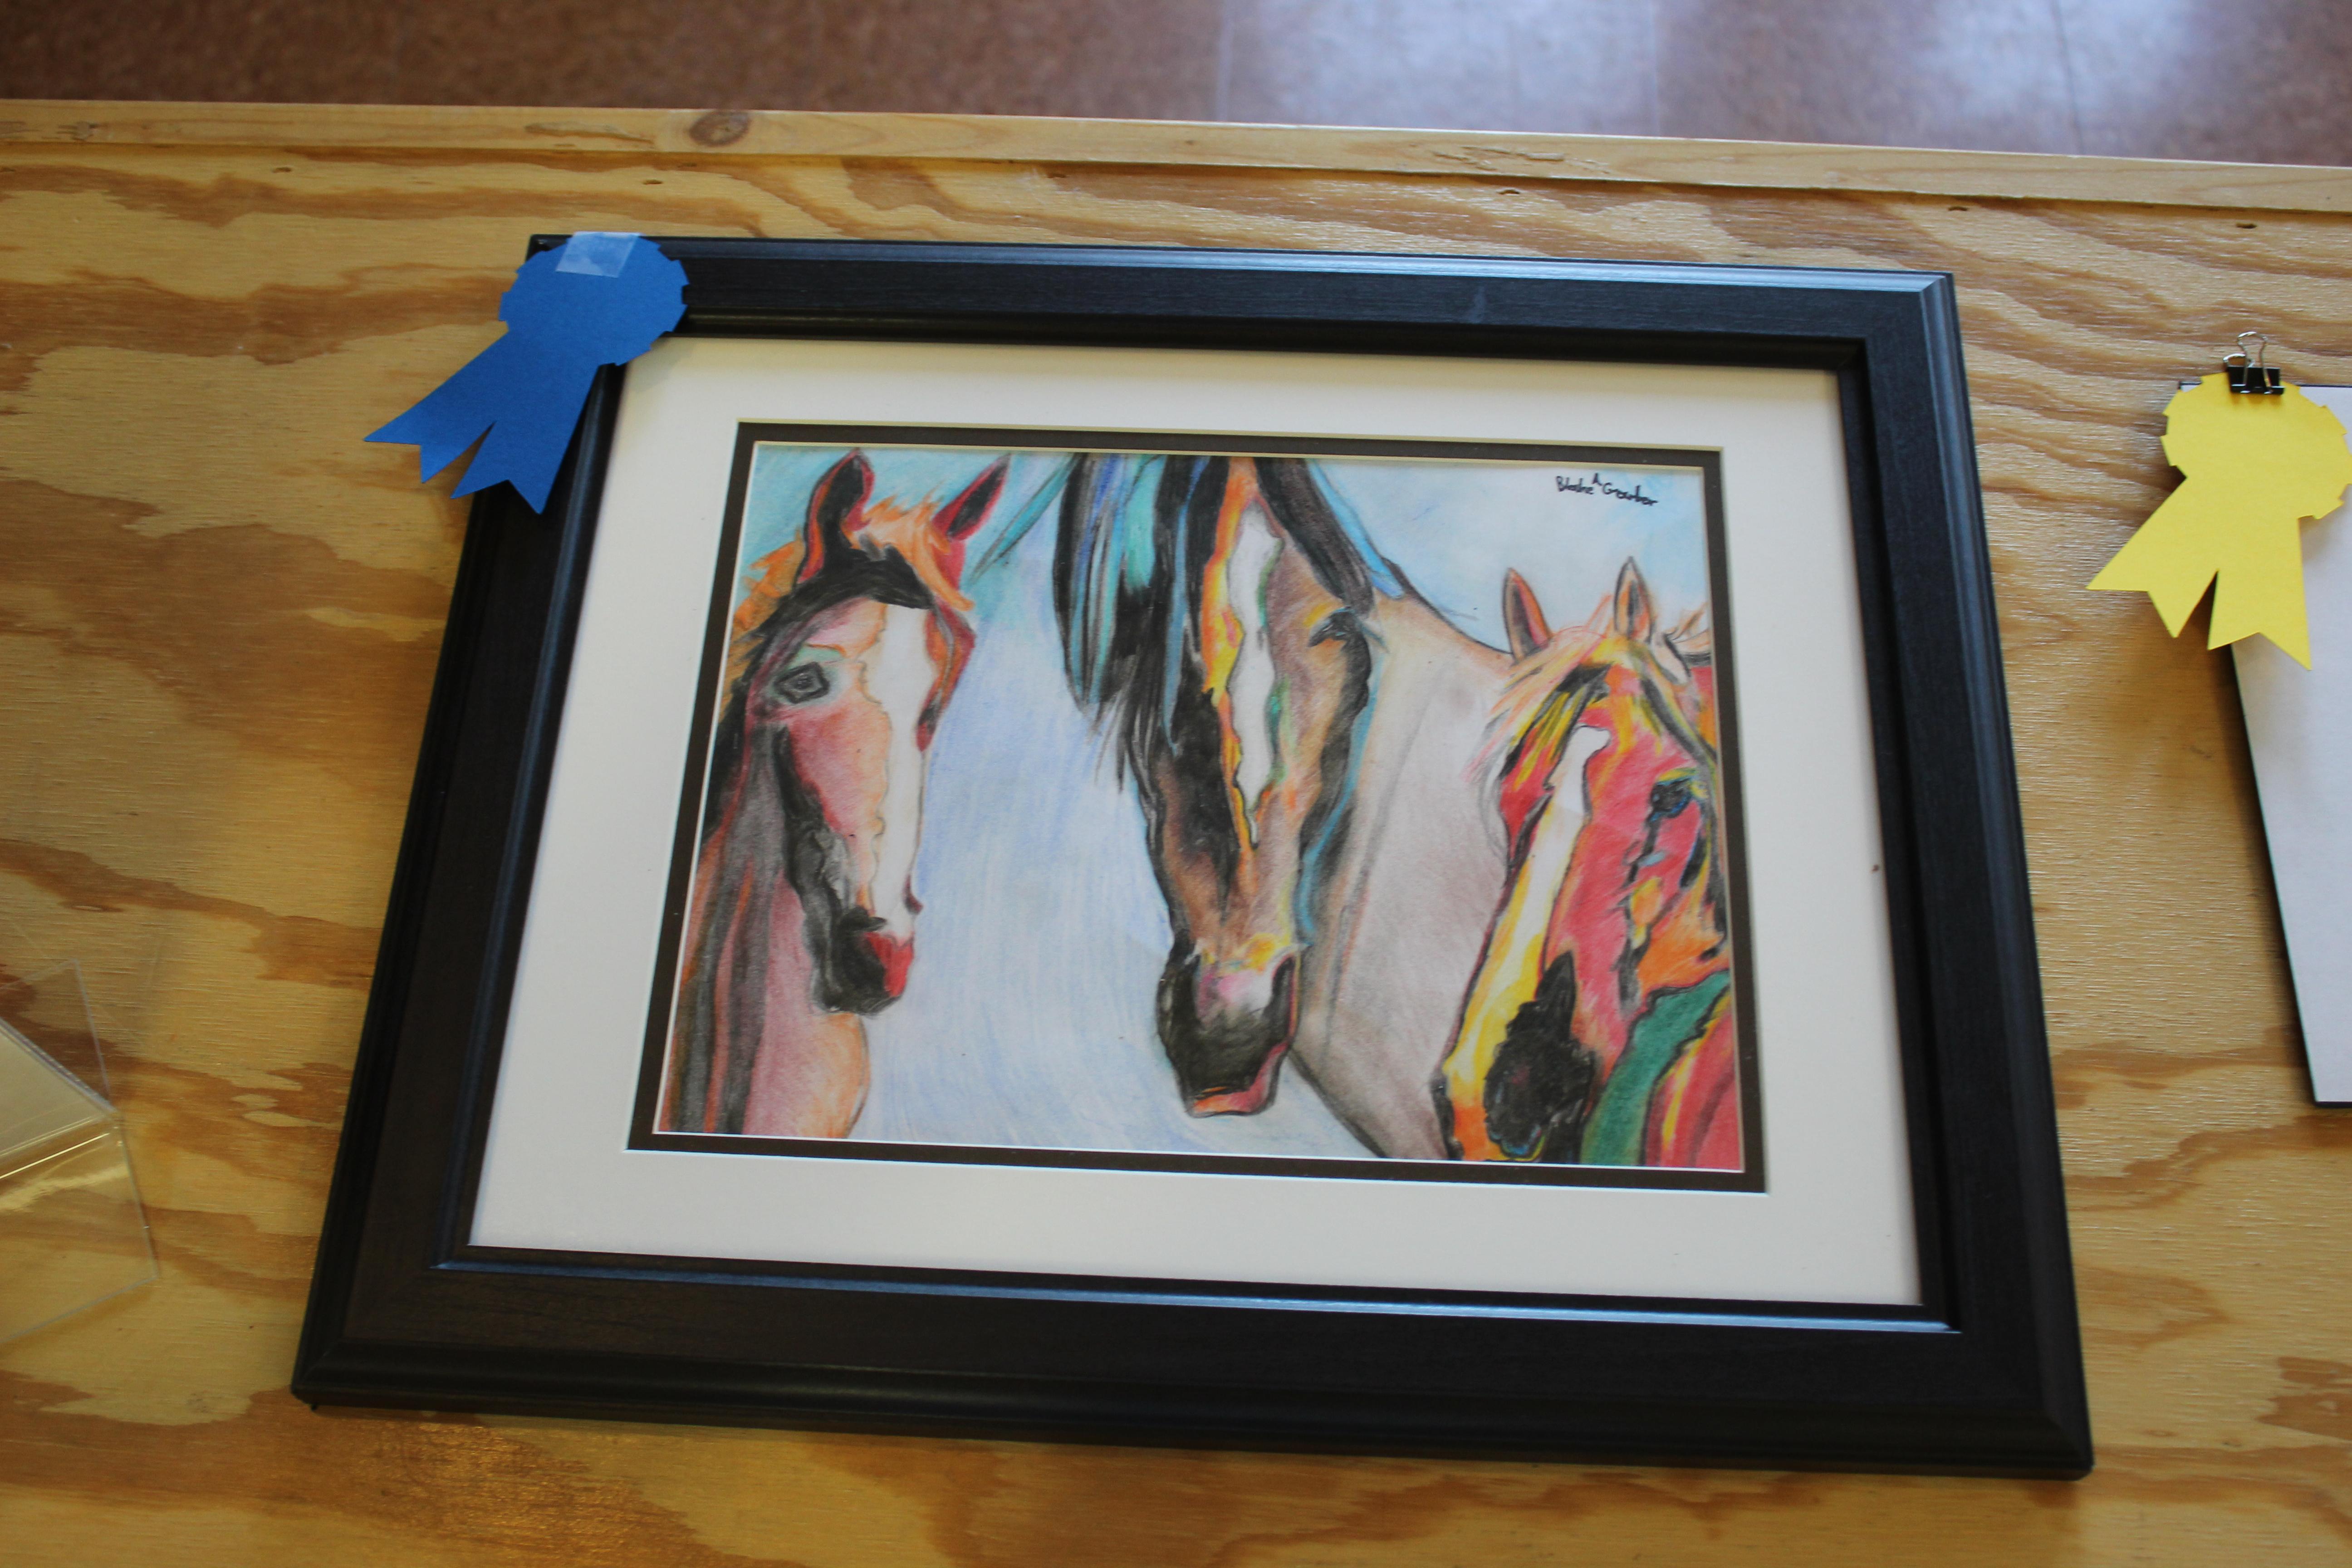 Drawing of three horses